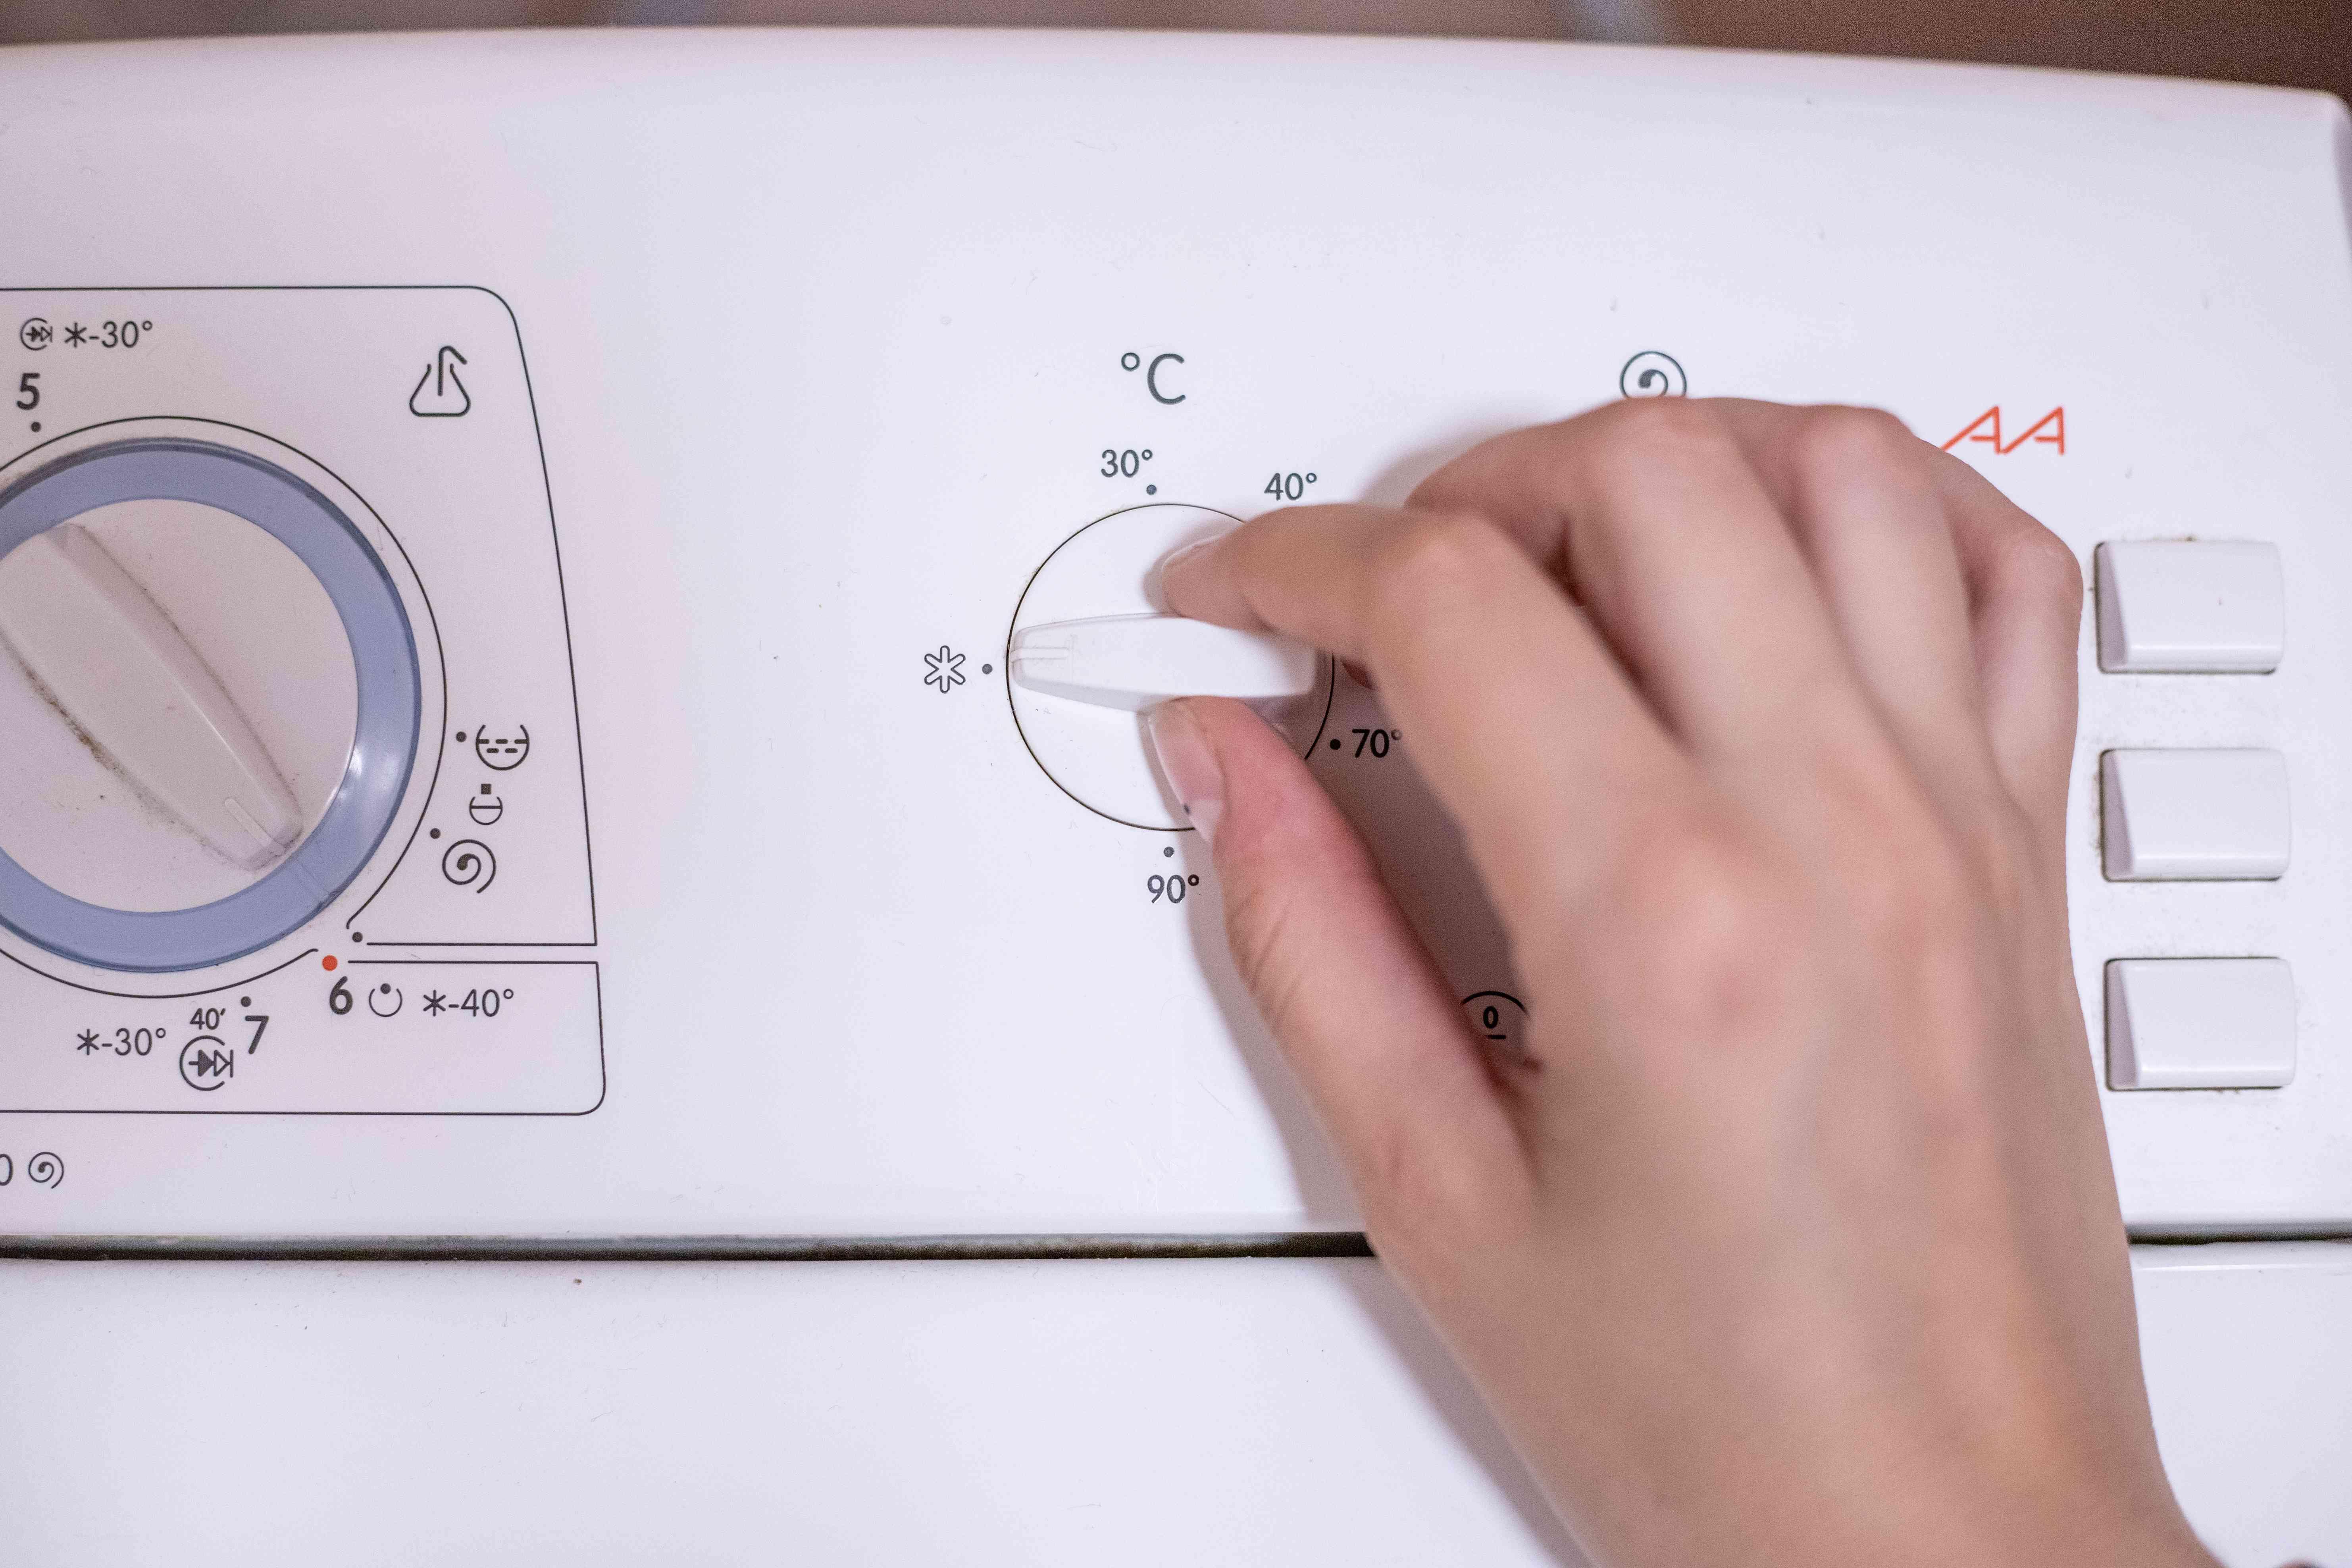 hand changes knob on washing machine to cold water wash